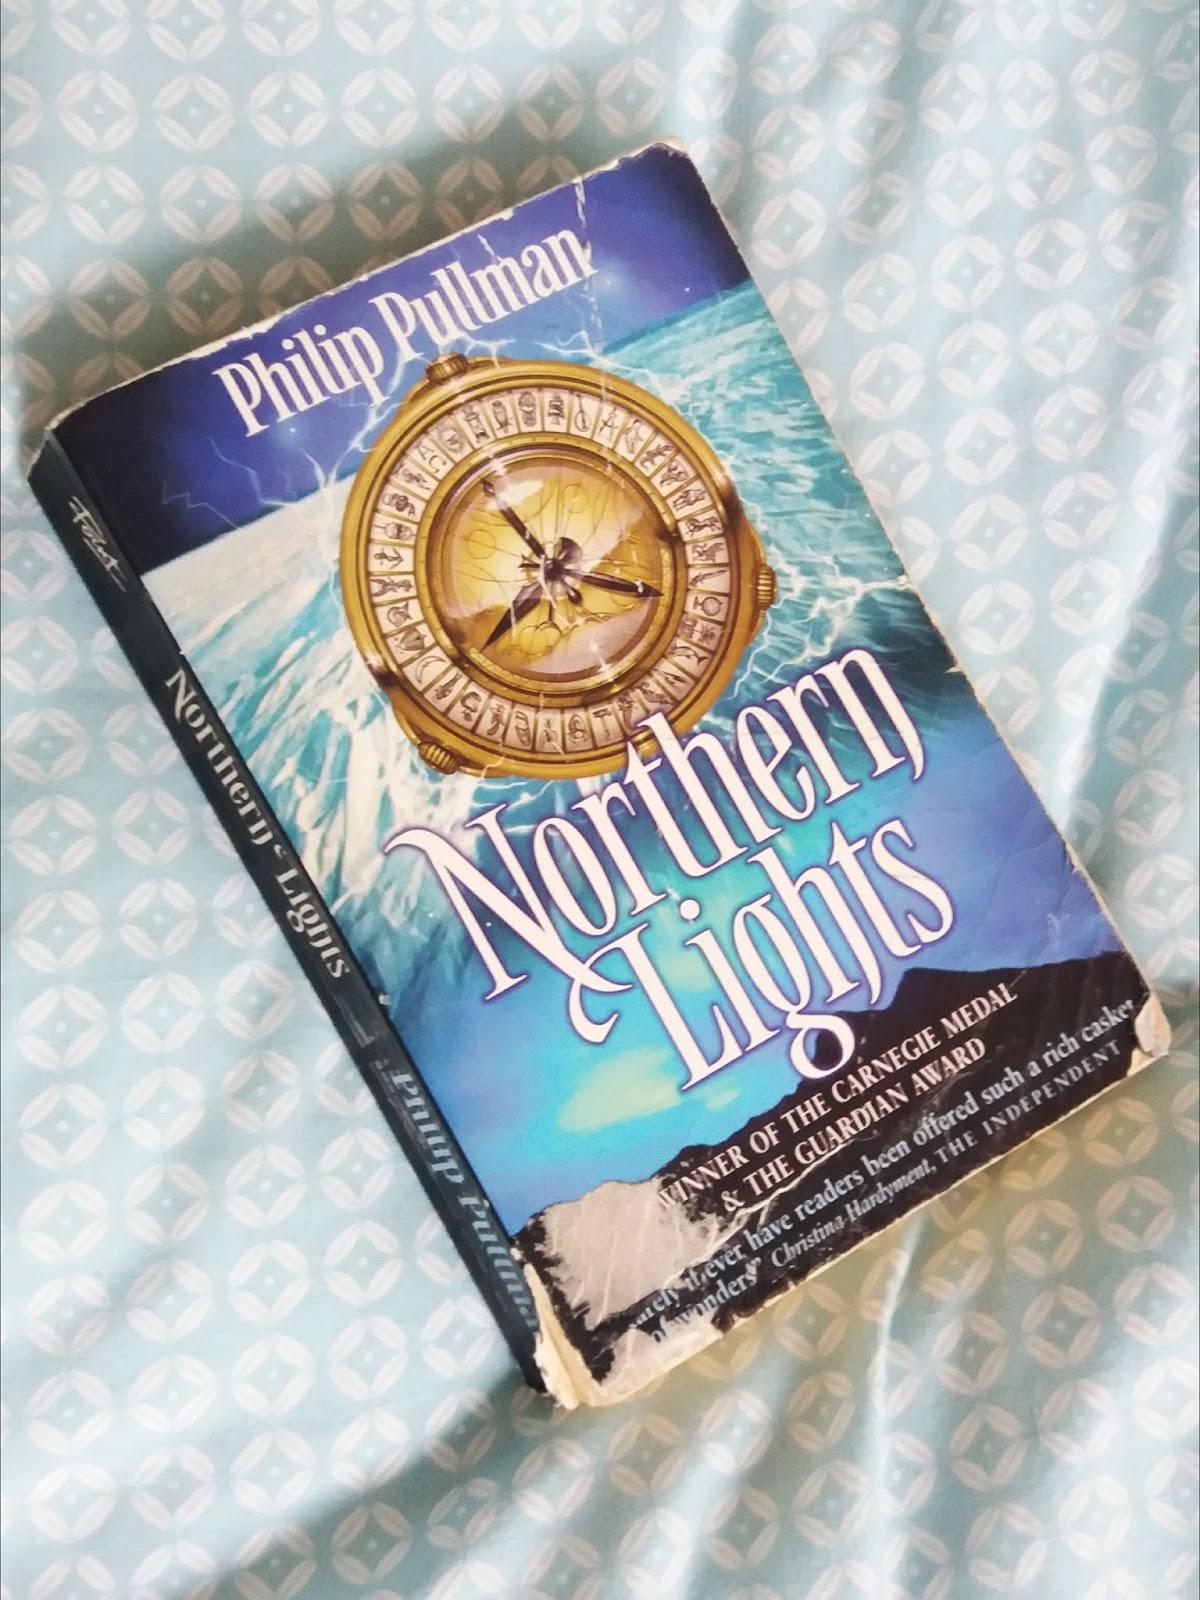 Northern Lights by Philip Pullman